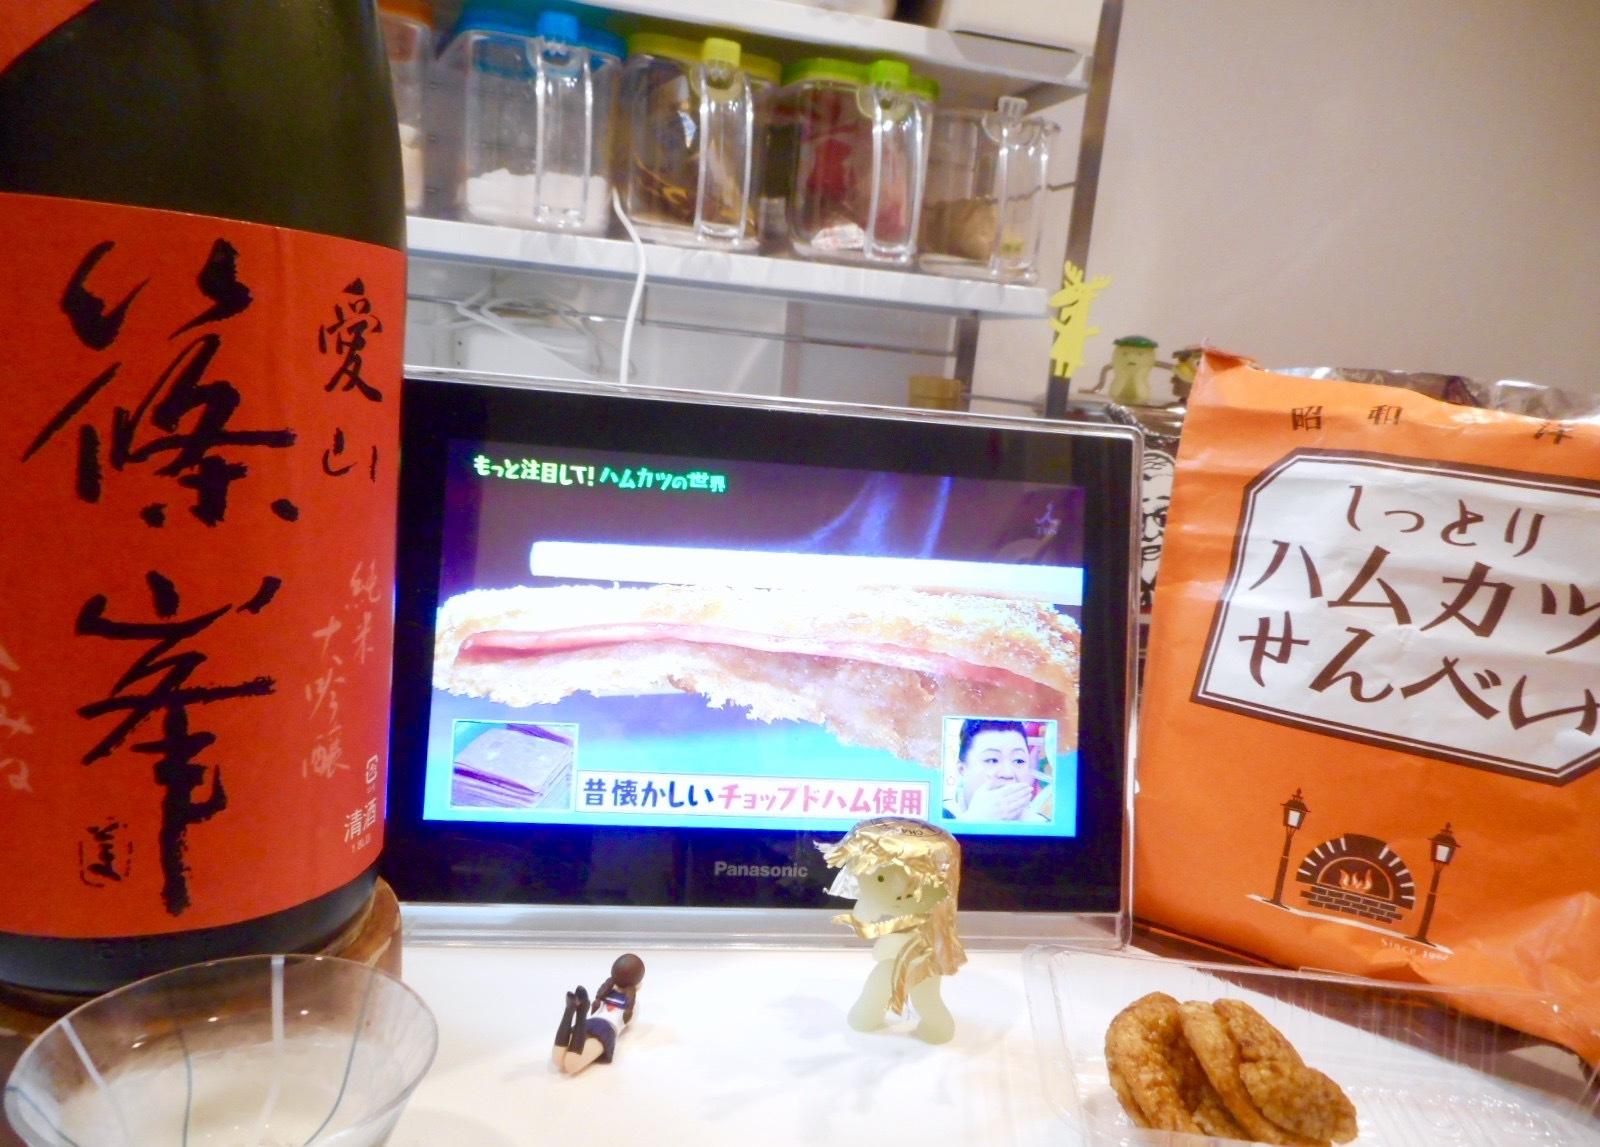 shinomine_aiyama45_27by4_11.jpg